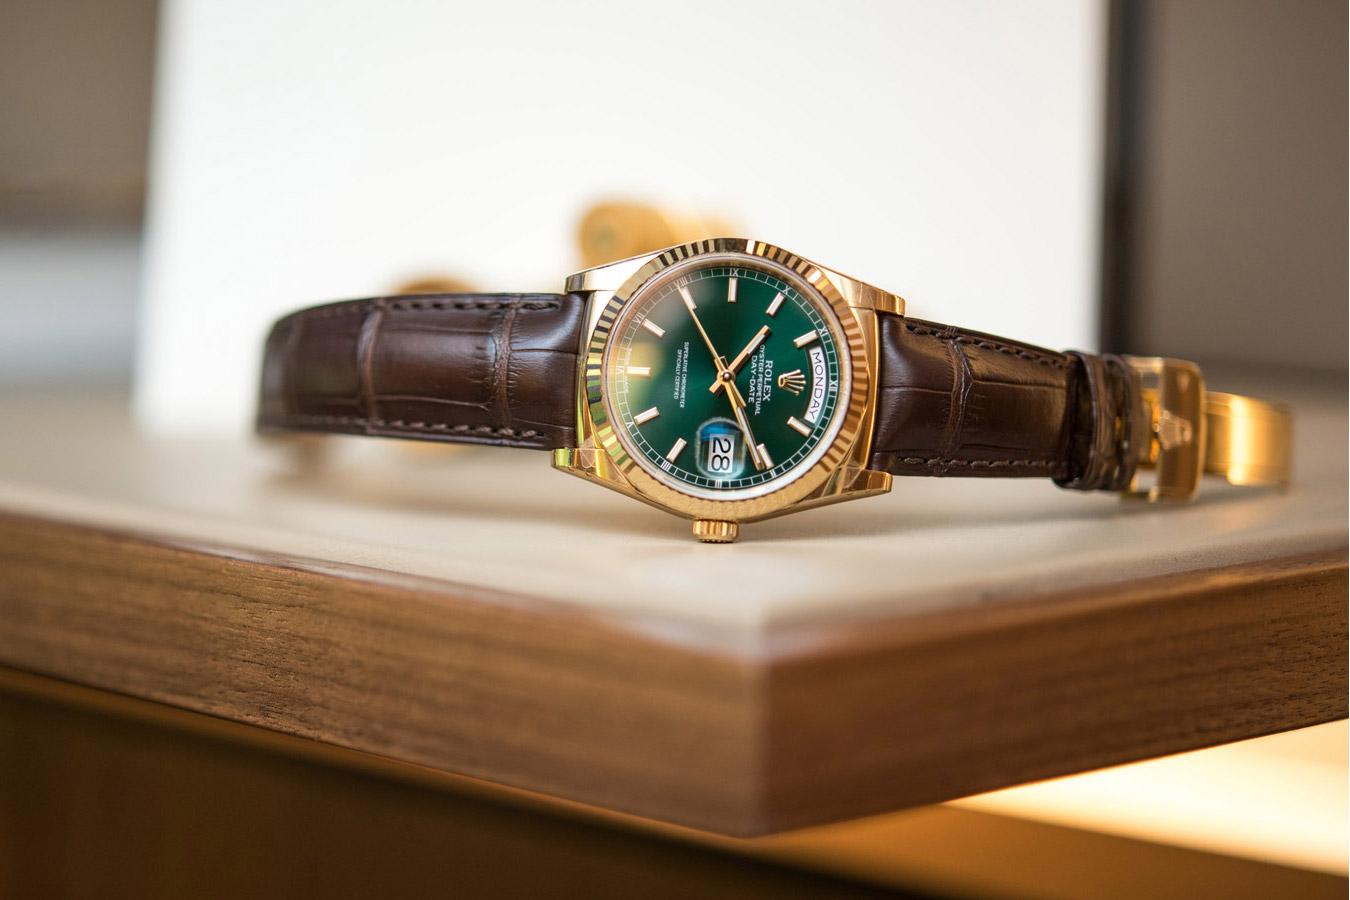 Rolex Day-Date 36 - Ref. 118138